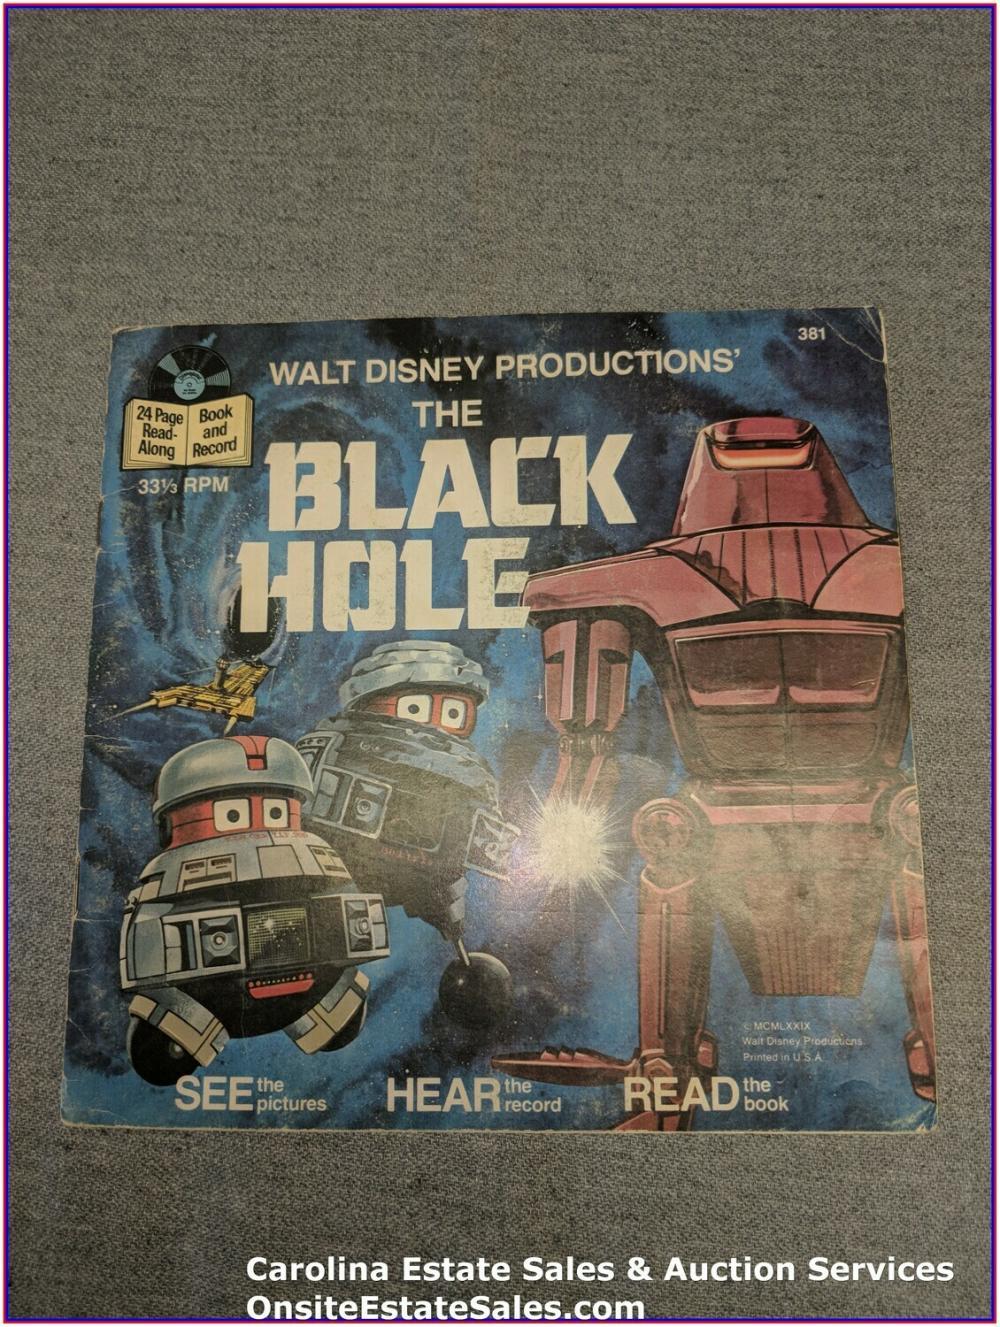 The Black Hole - Disney Book & Record